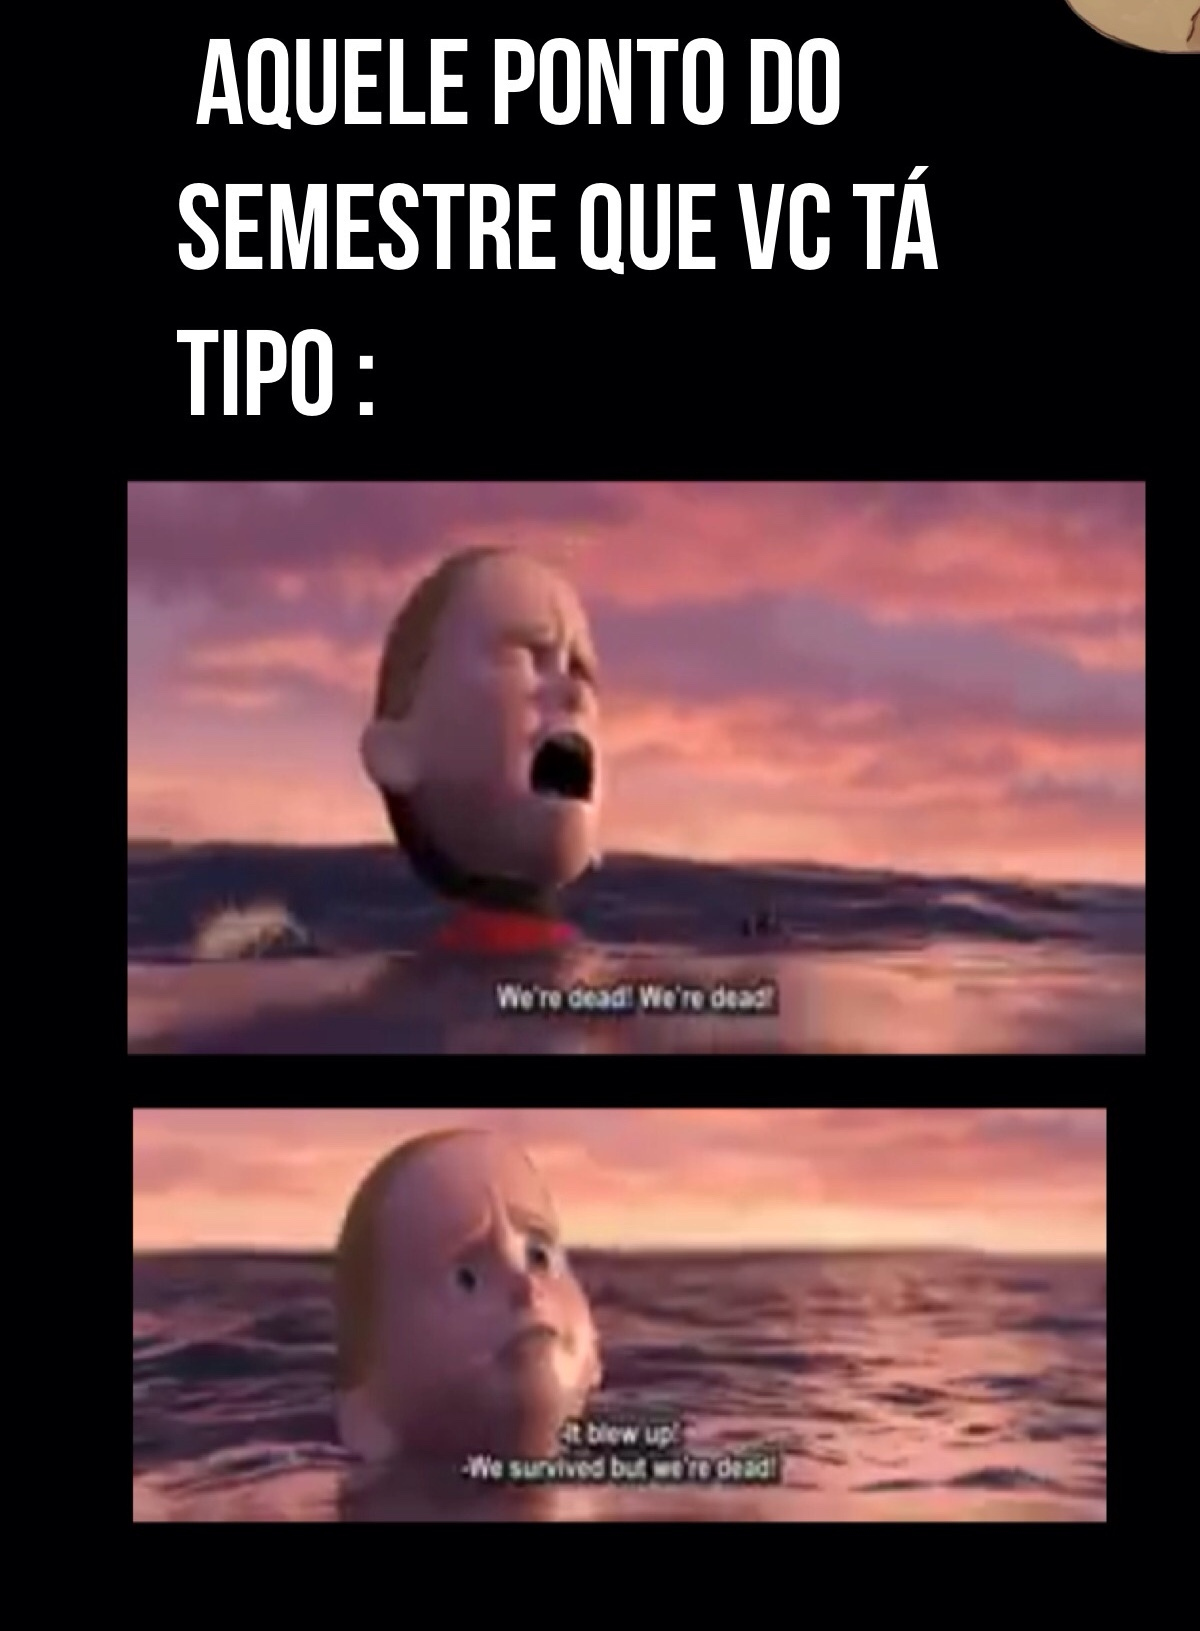 ultimo semestre - meme